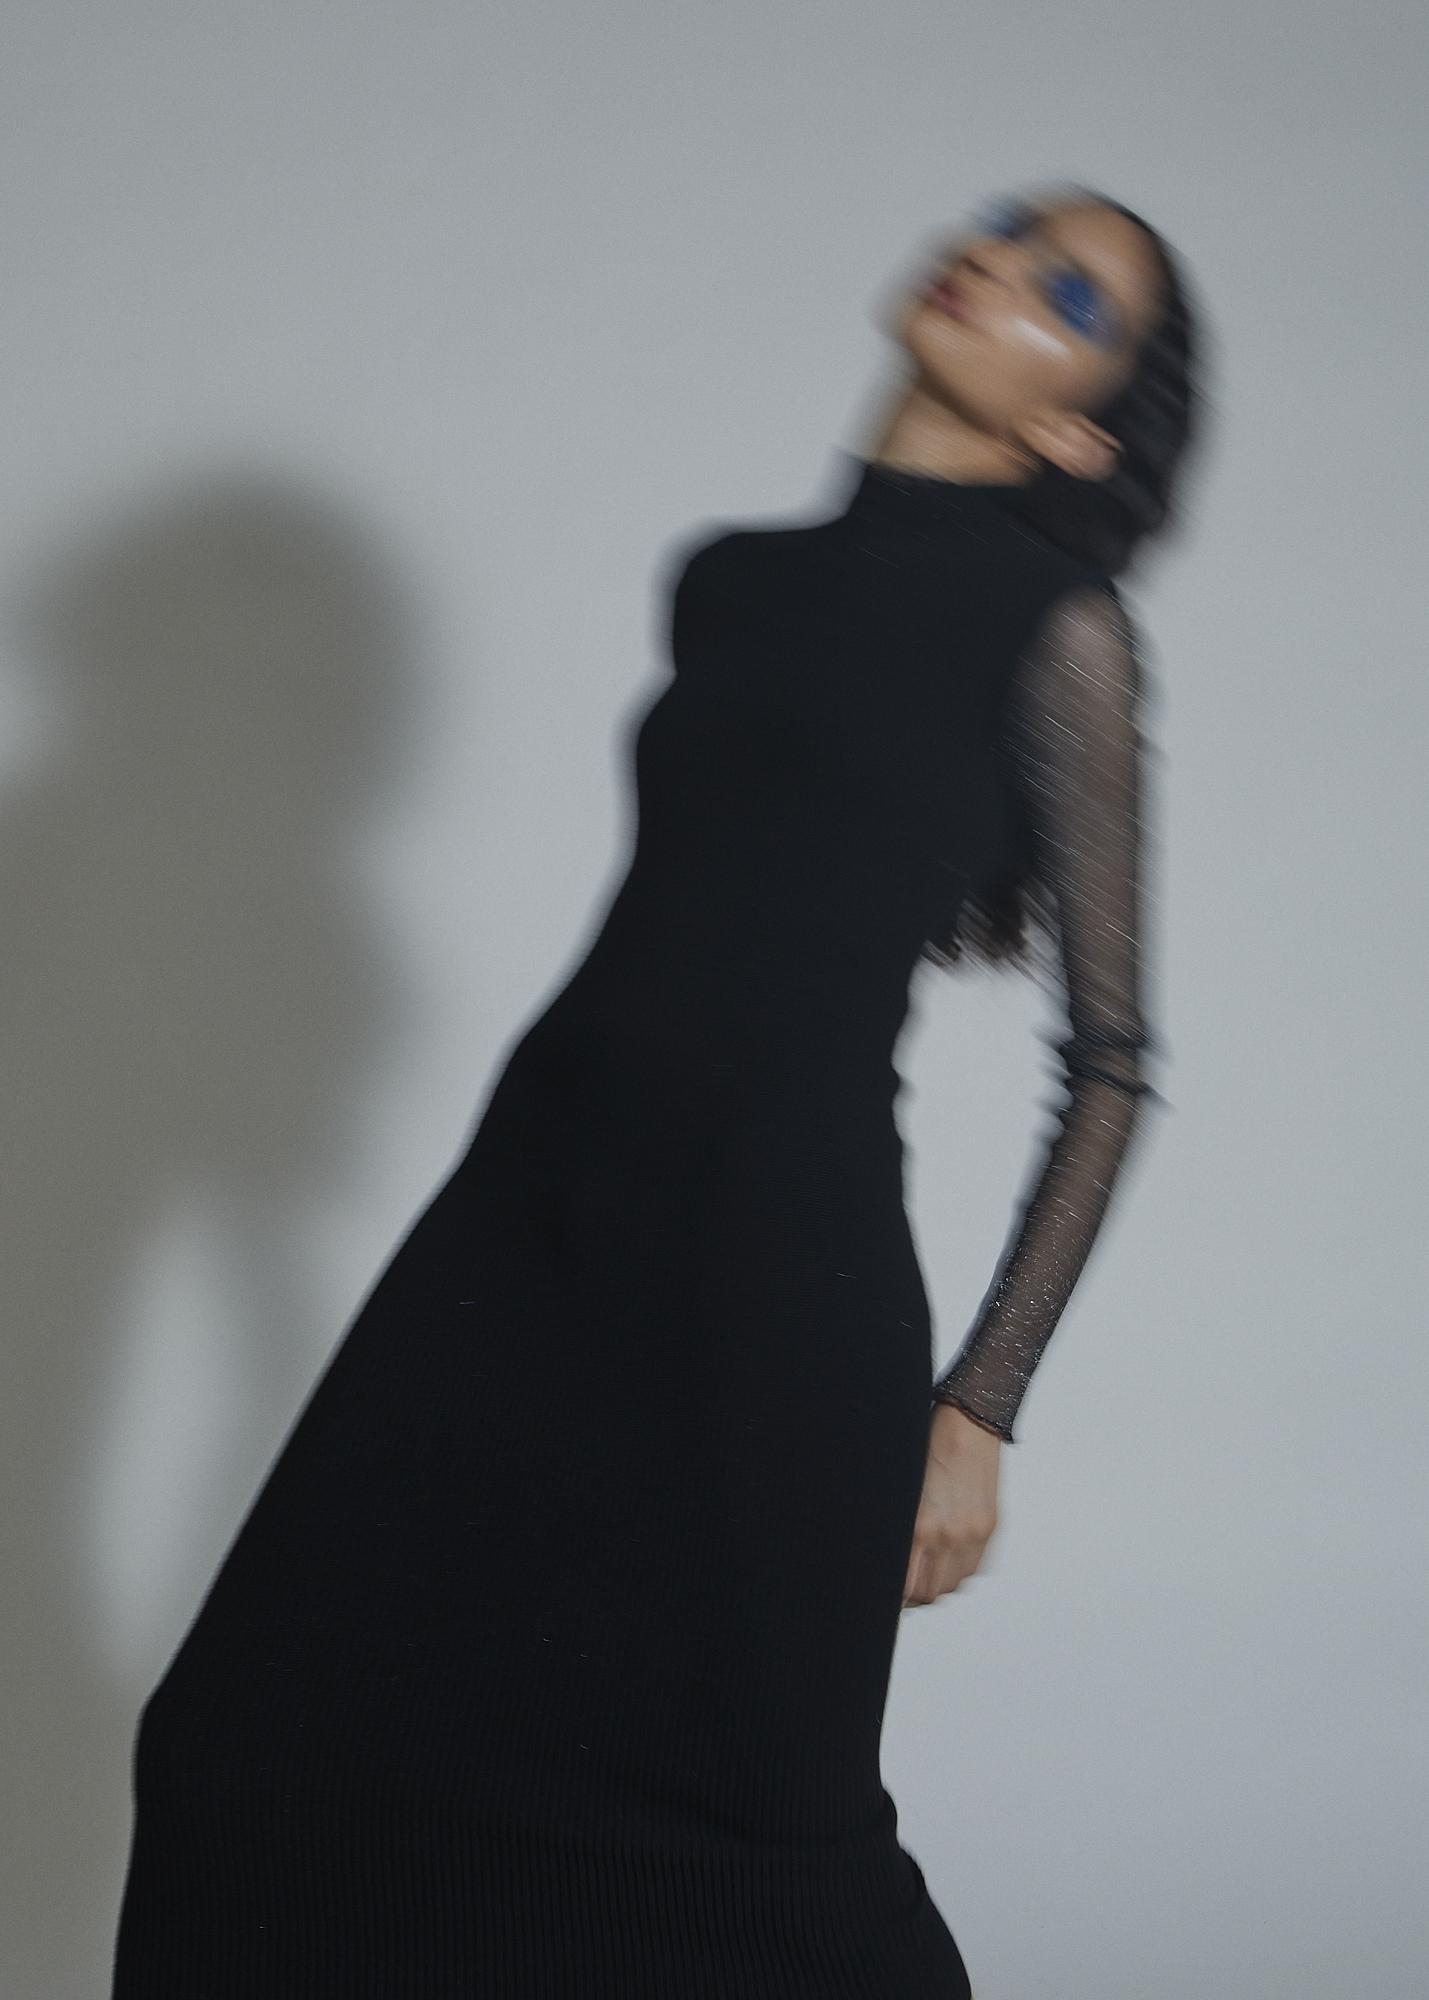 Jennelle-Fong_2020.09_Bluets_AMP-Mag4273